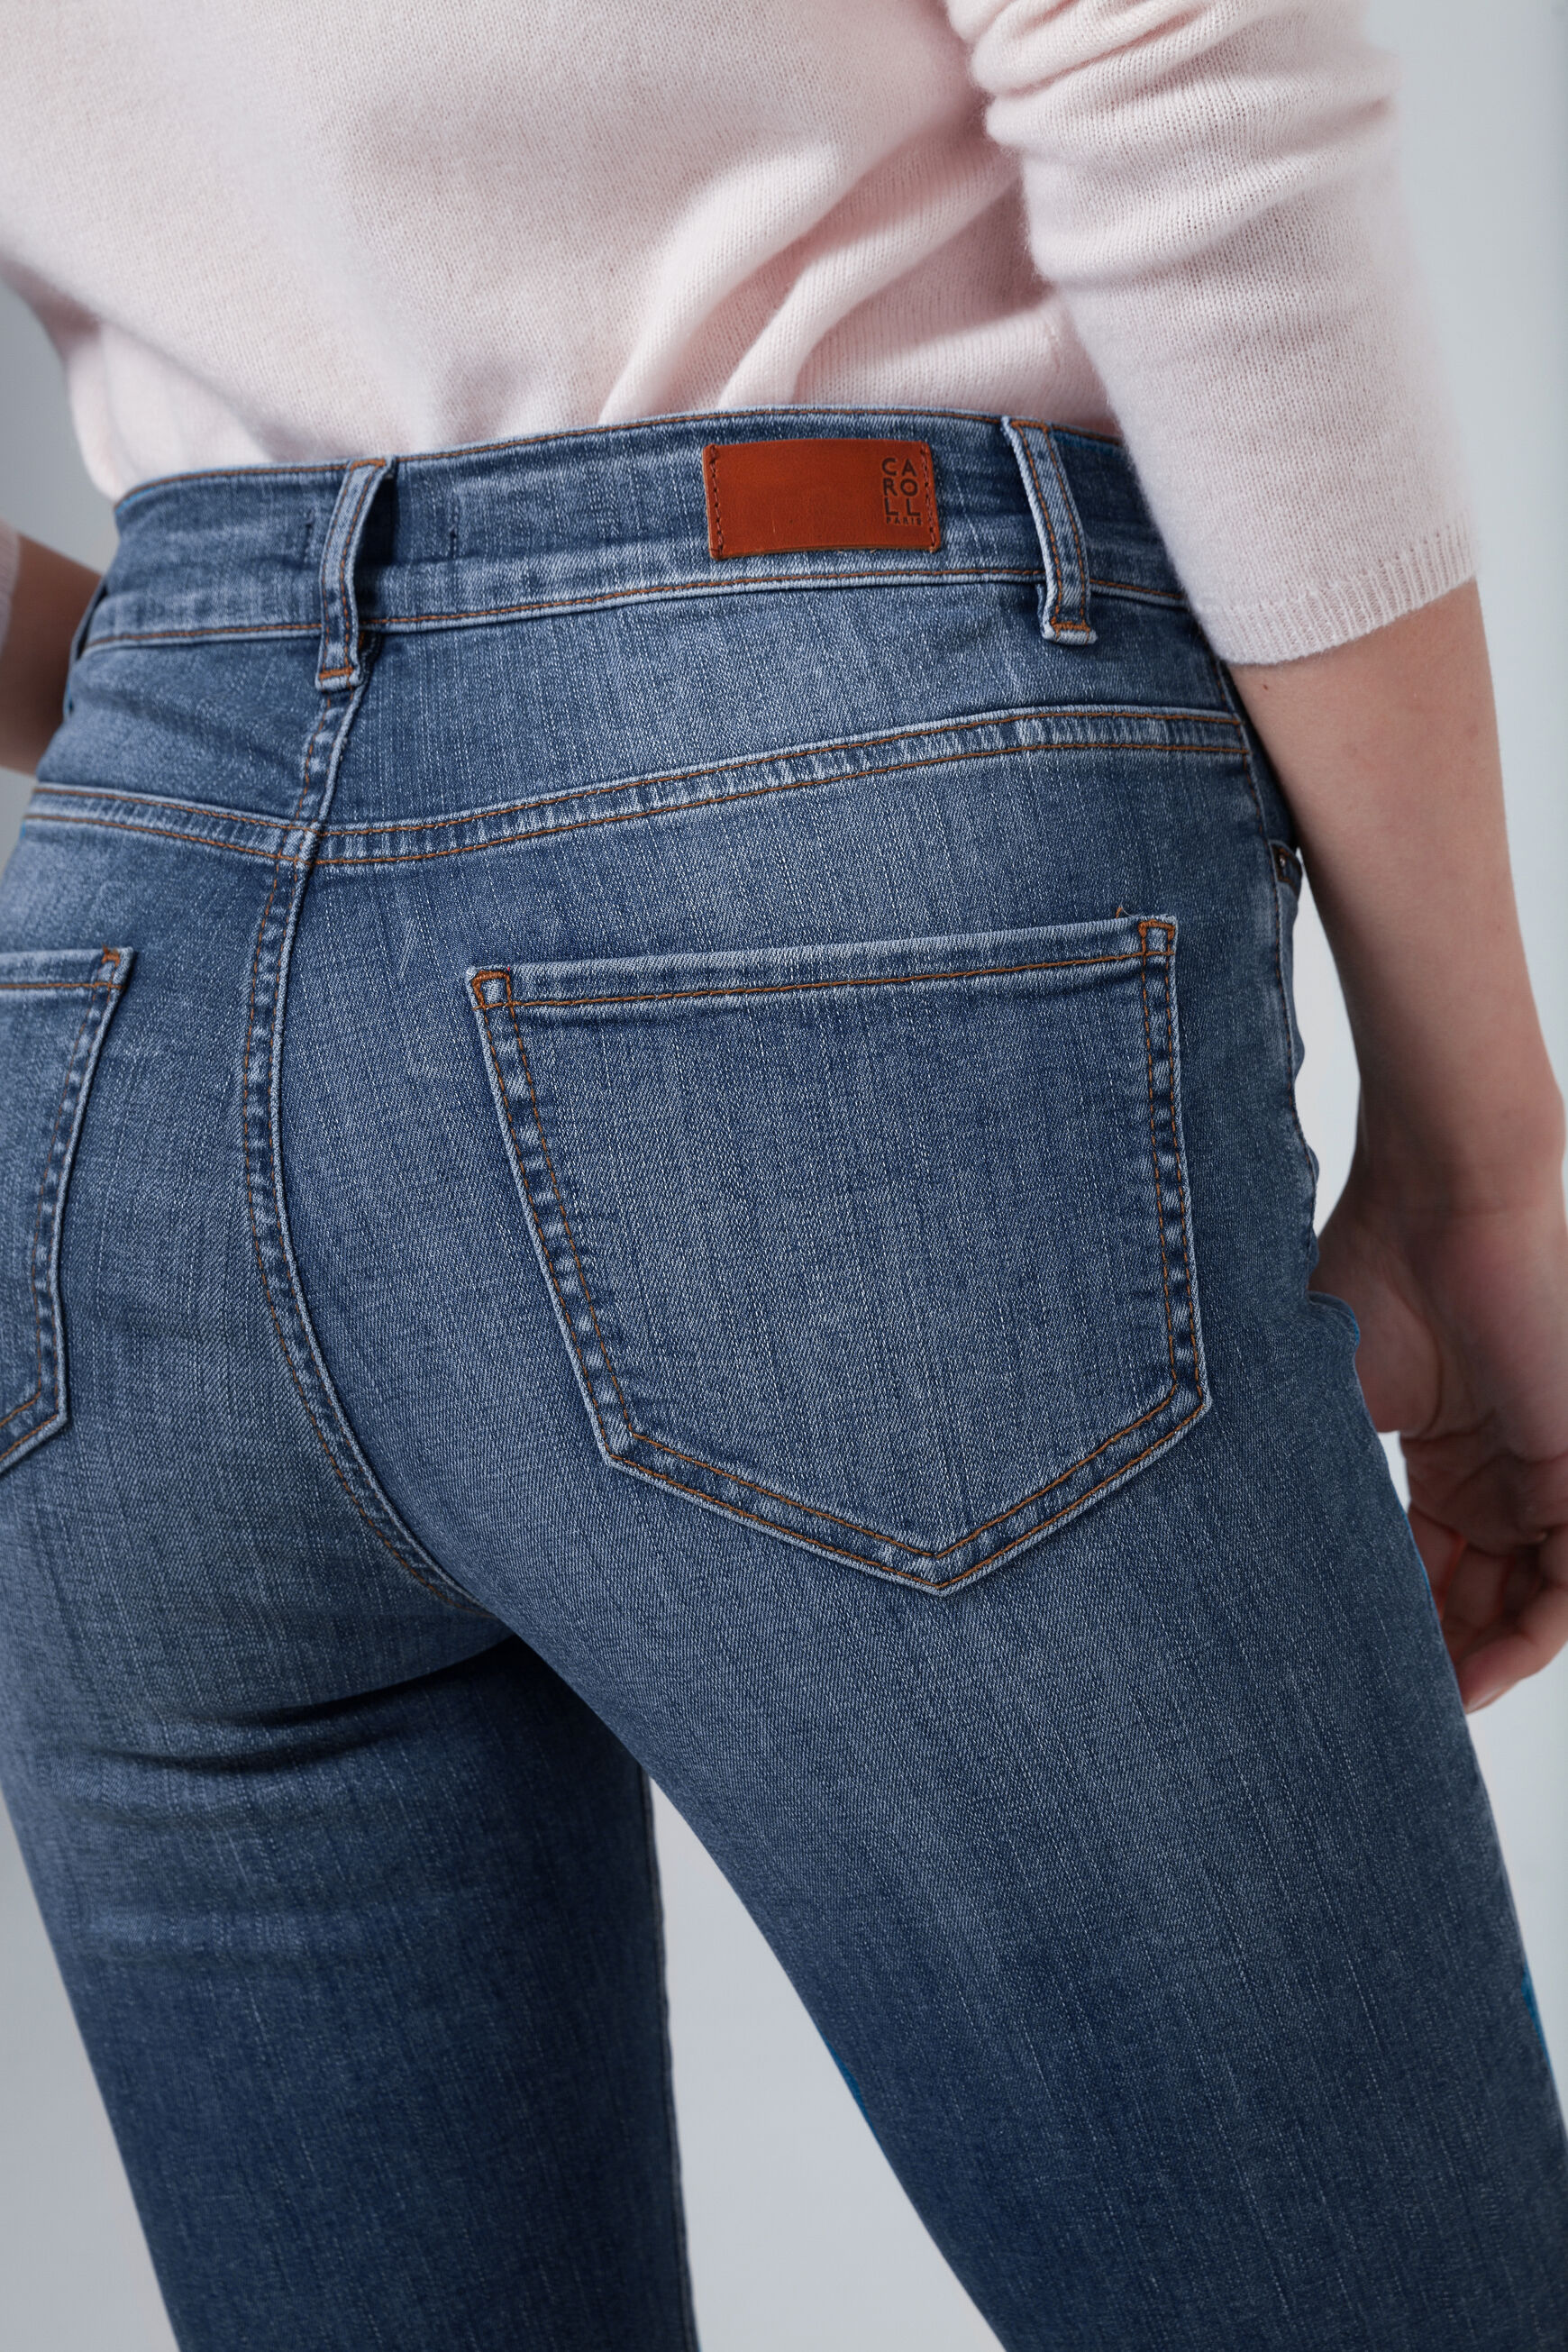 Chic FemmeVotre Pantalons Et Pantalon ÉlégantCaroll 8nvwON0m